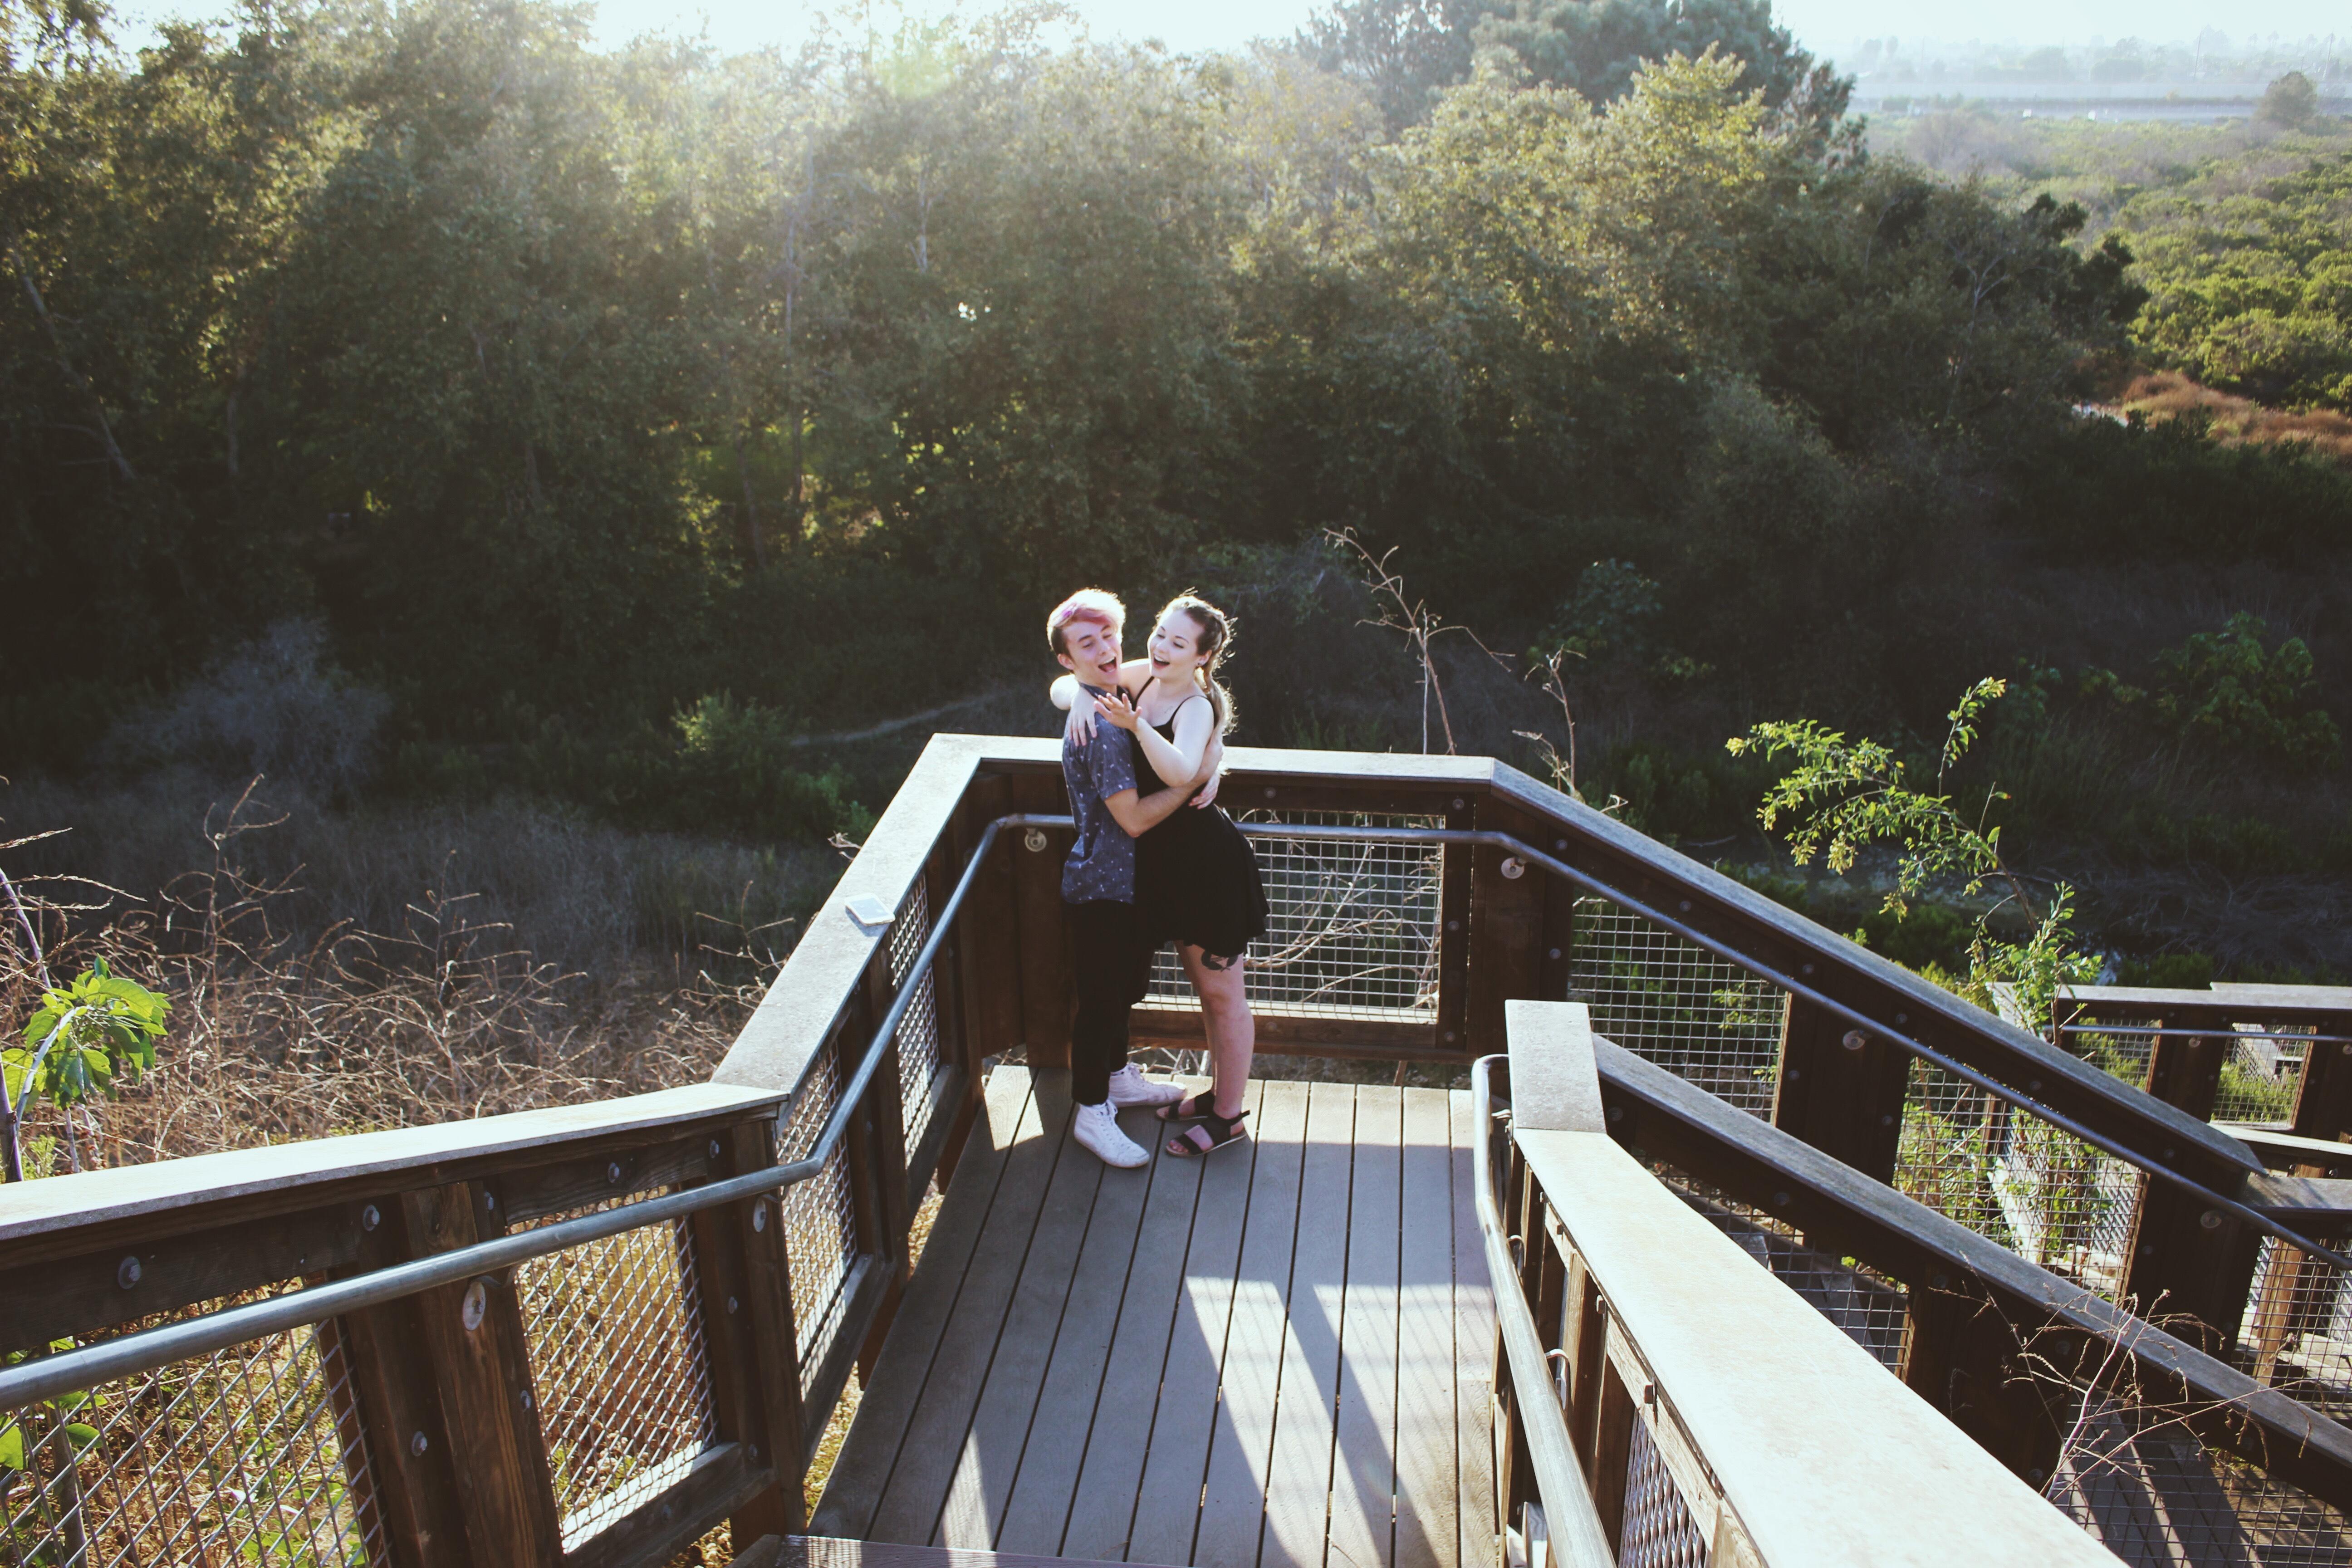 Image 5 of Liz and Conrad